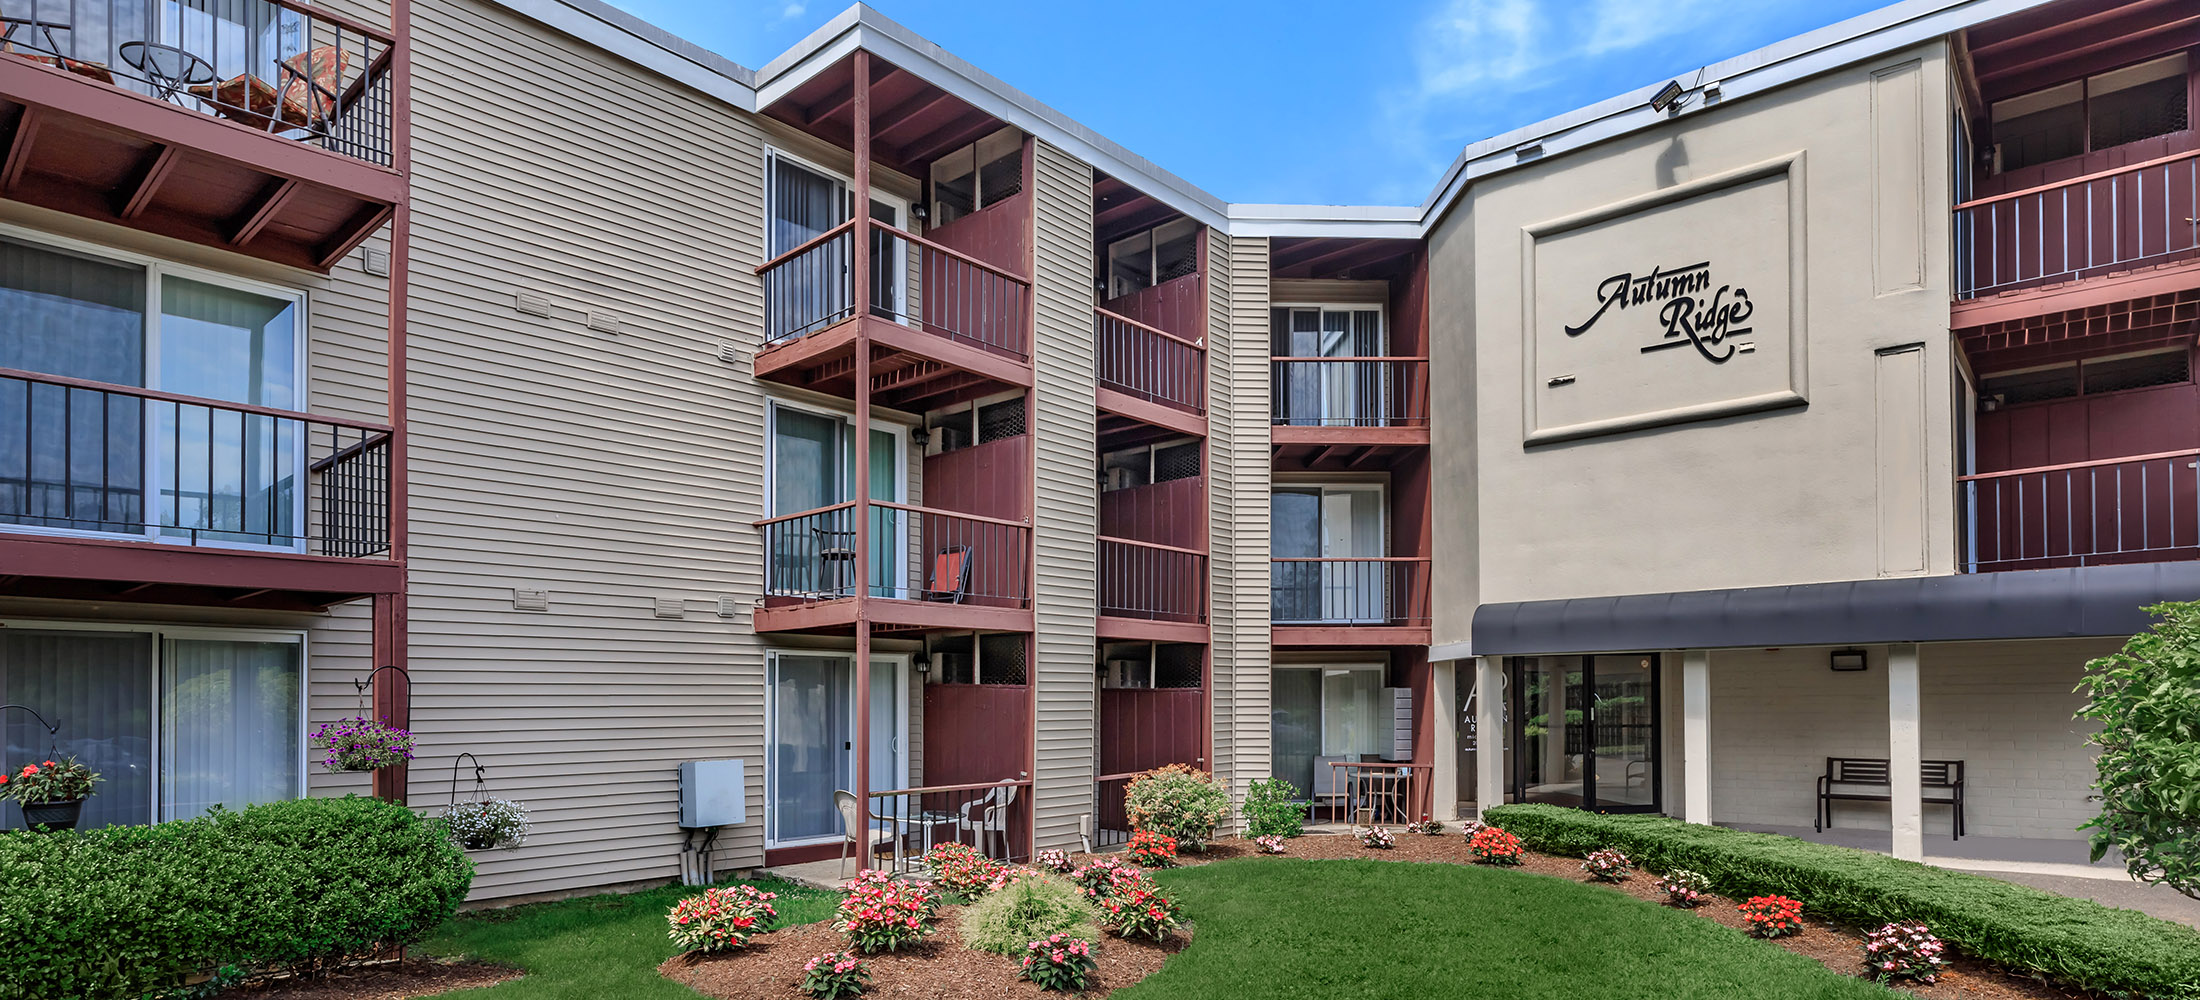 autumn ridge - apartments in east haven, ct